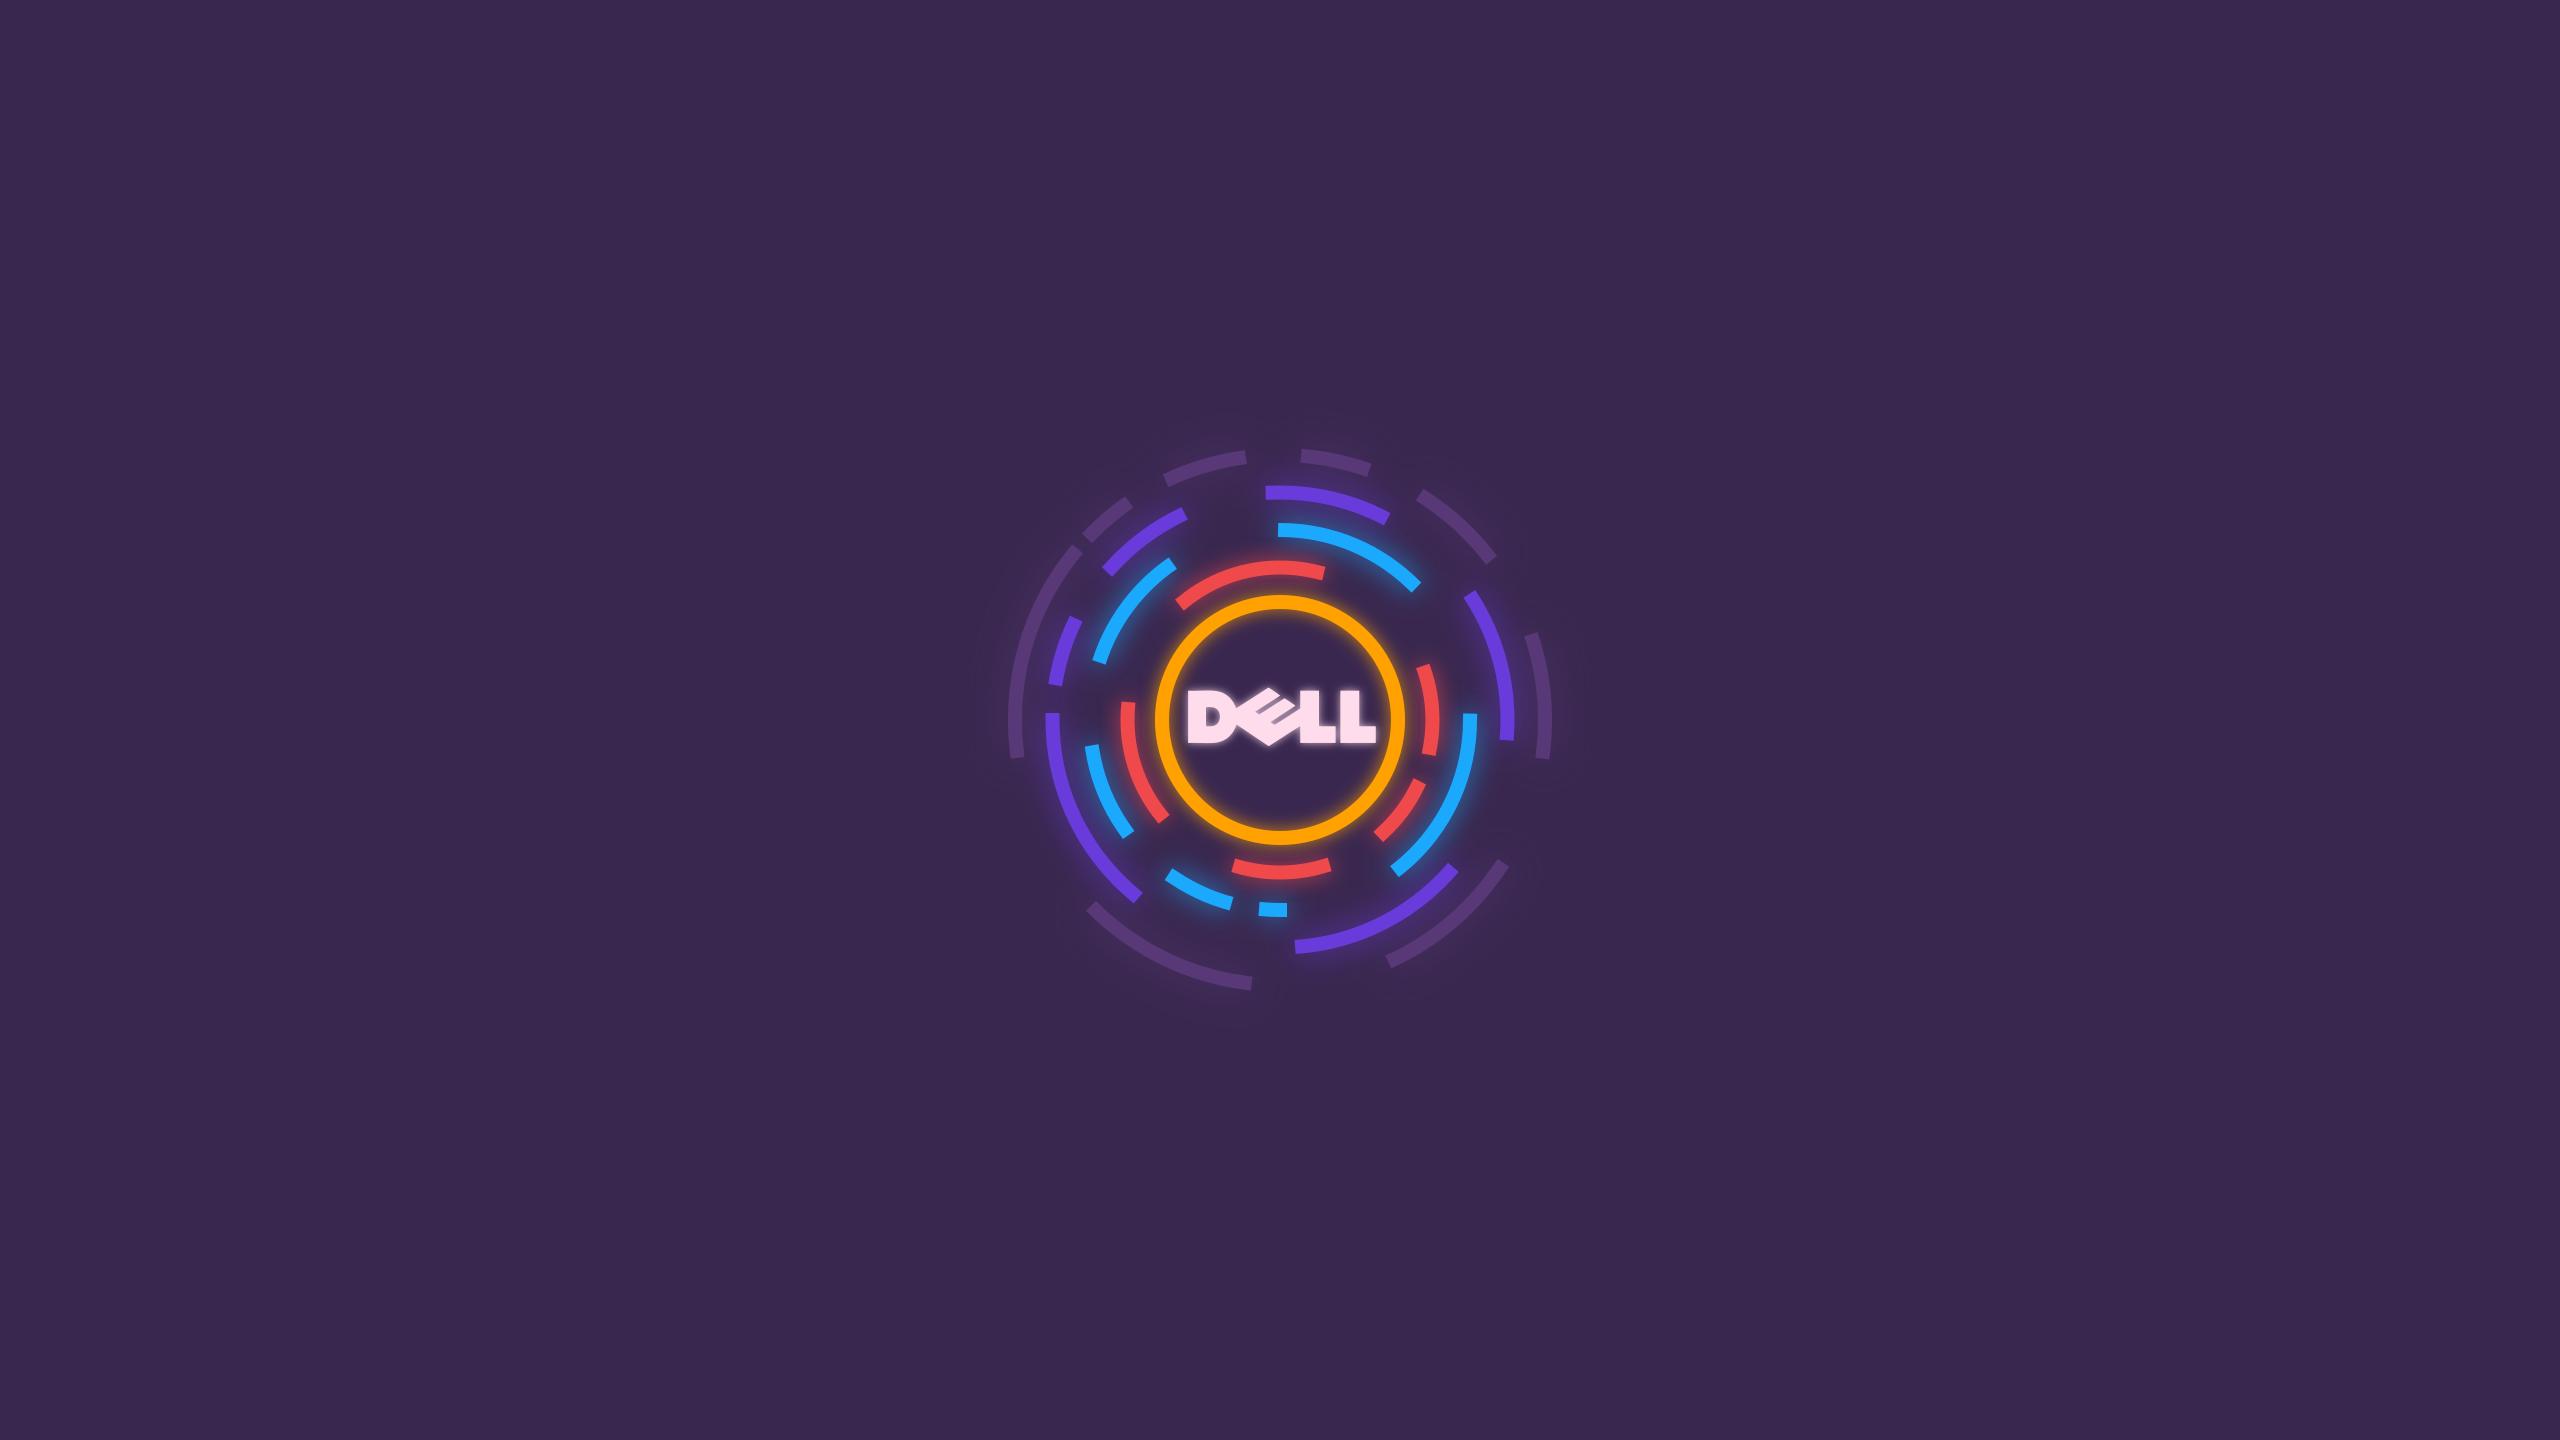 Papel De Parede Dell G3: Papel De Parede : Dell, Roxa, Minimalismo 2560x1440